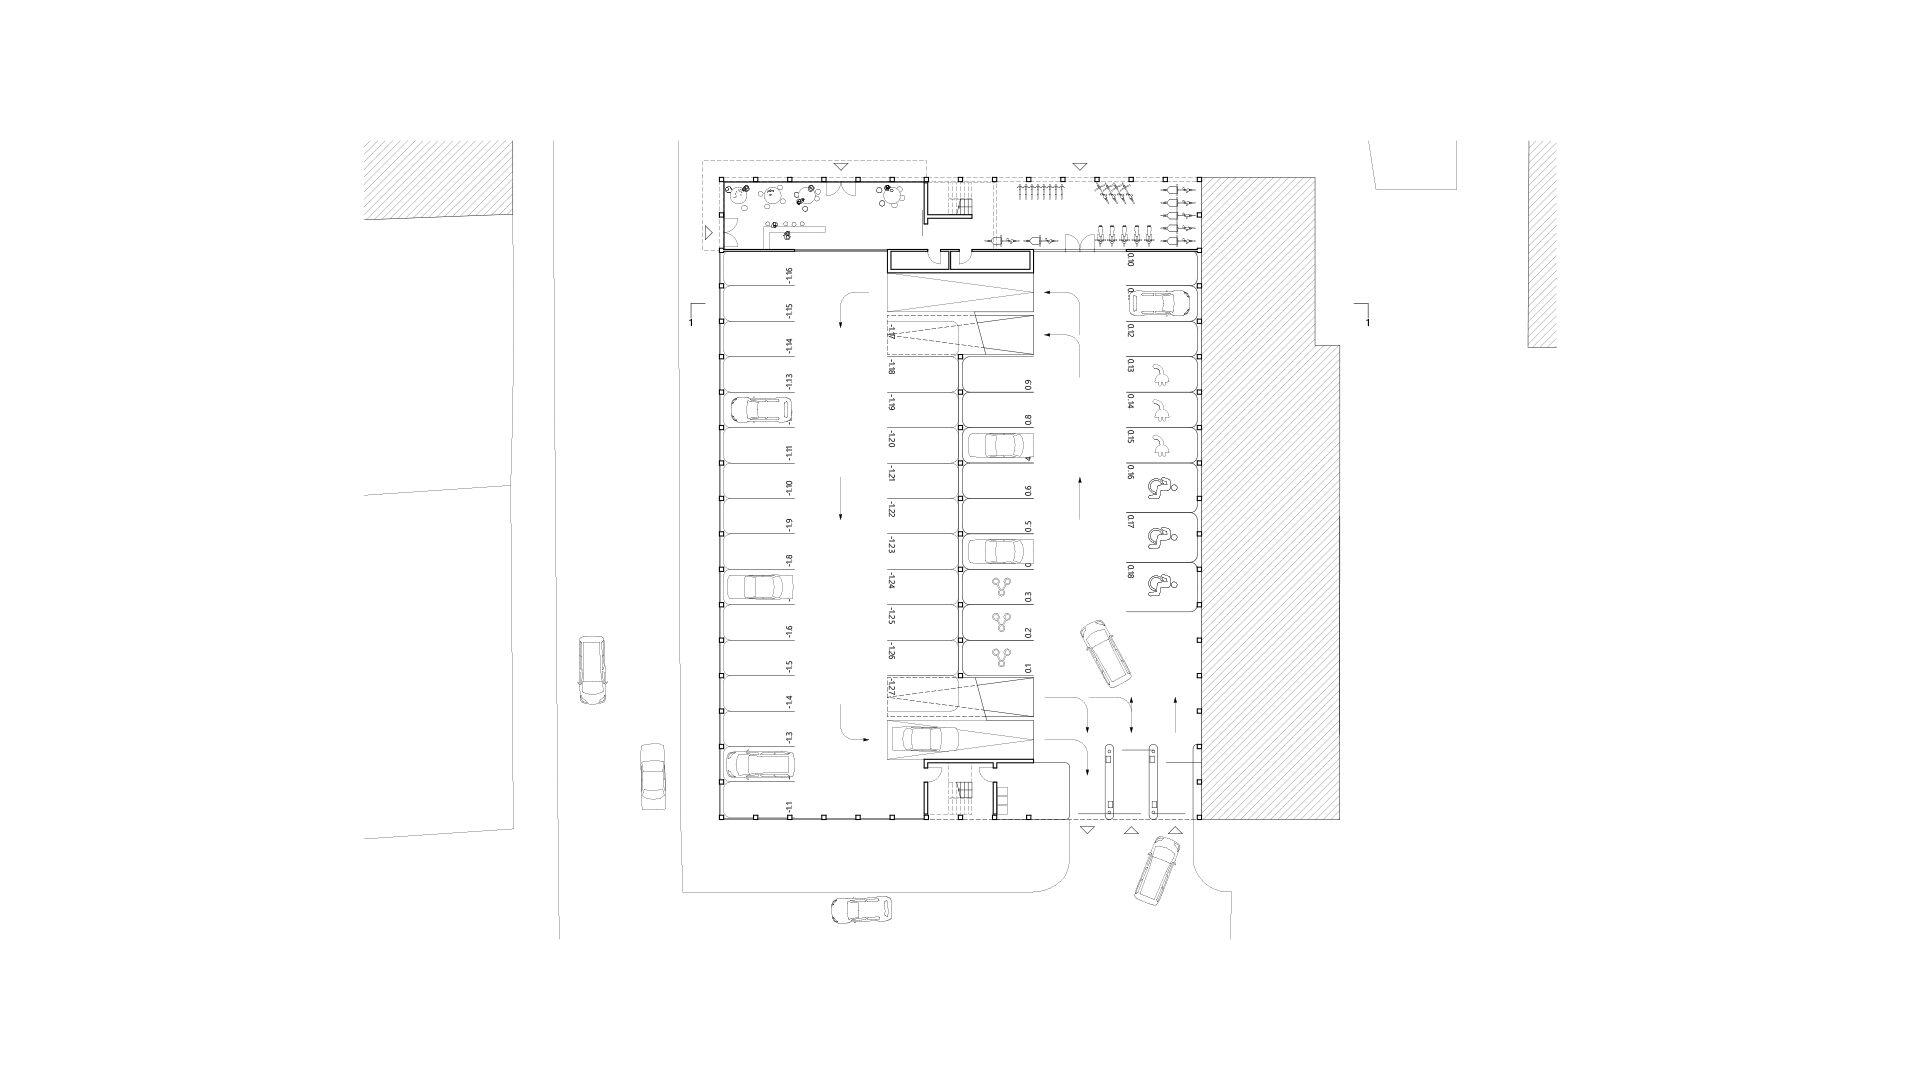 Kulturquartier Lagarde Parkpaletten, Bamberg | Sauerzapfe Architekten